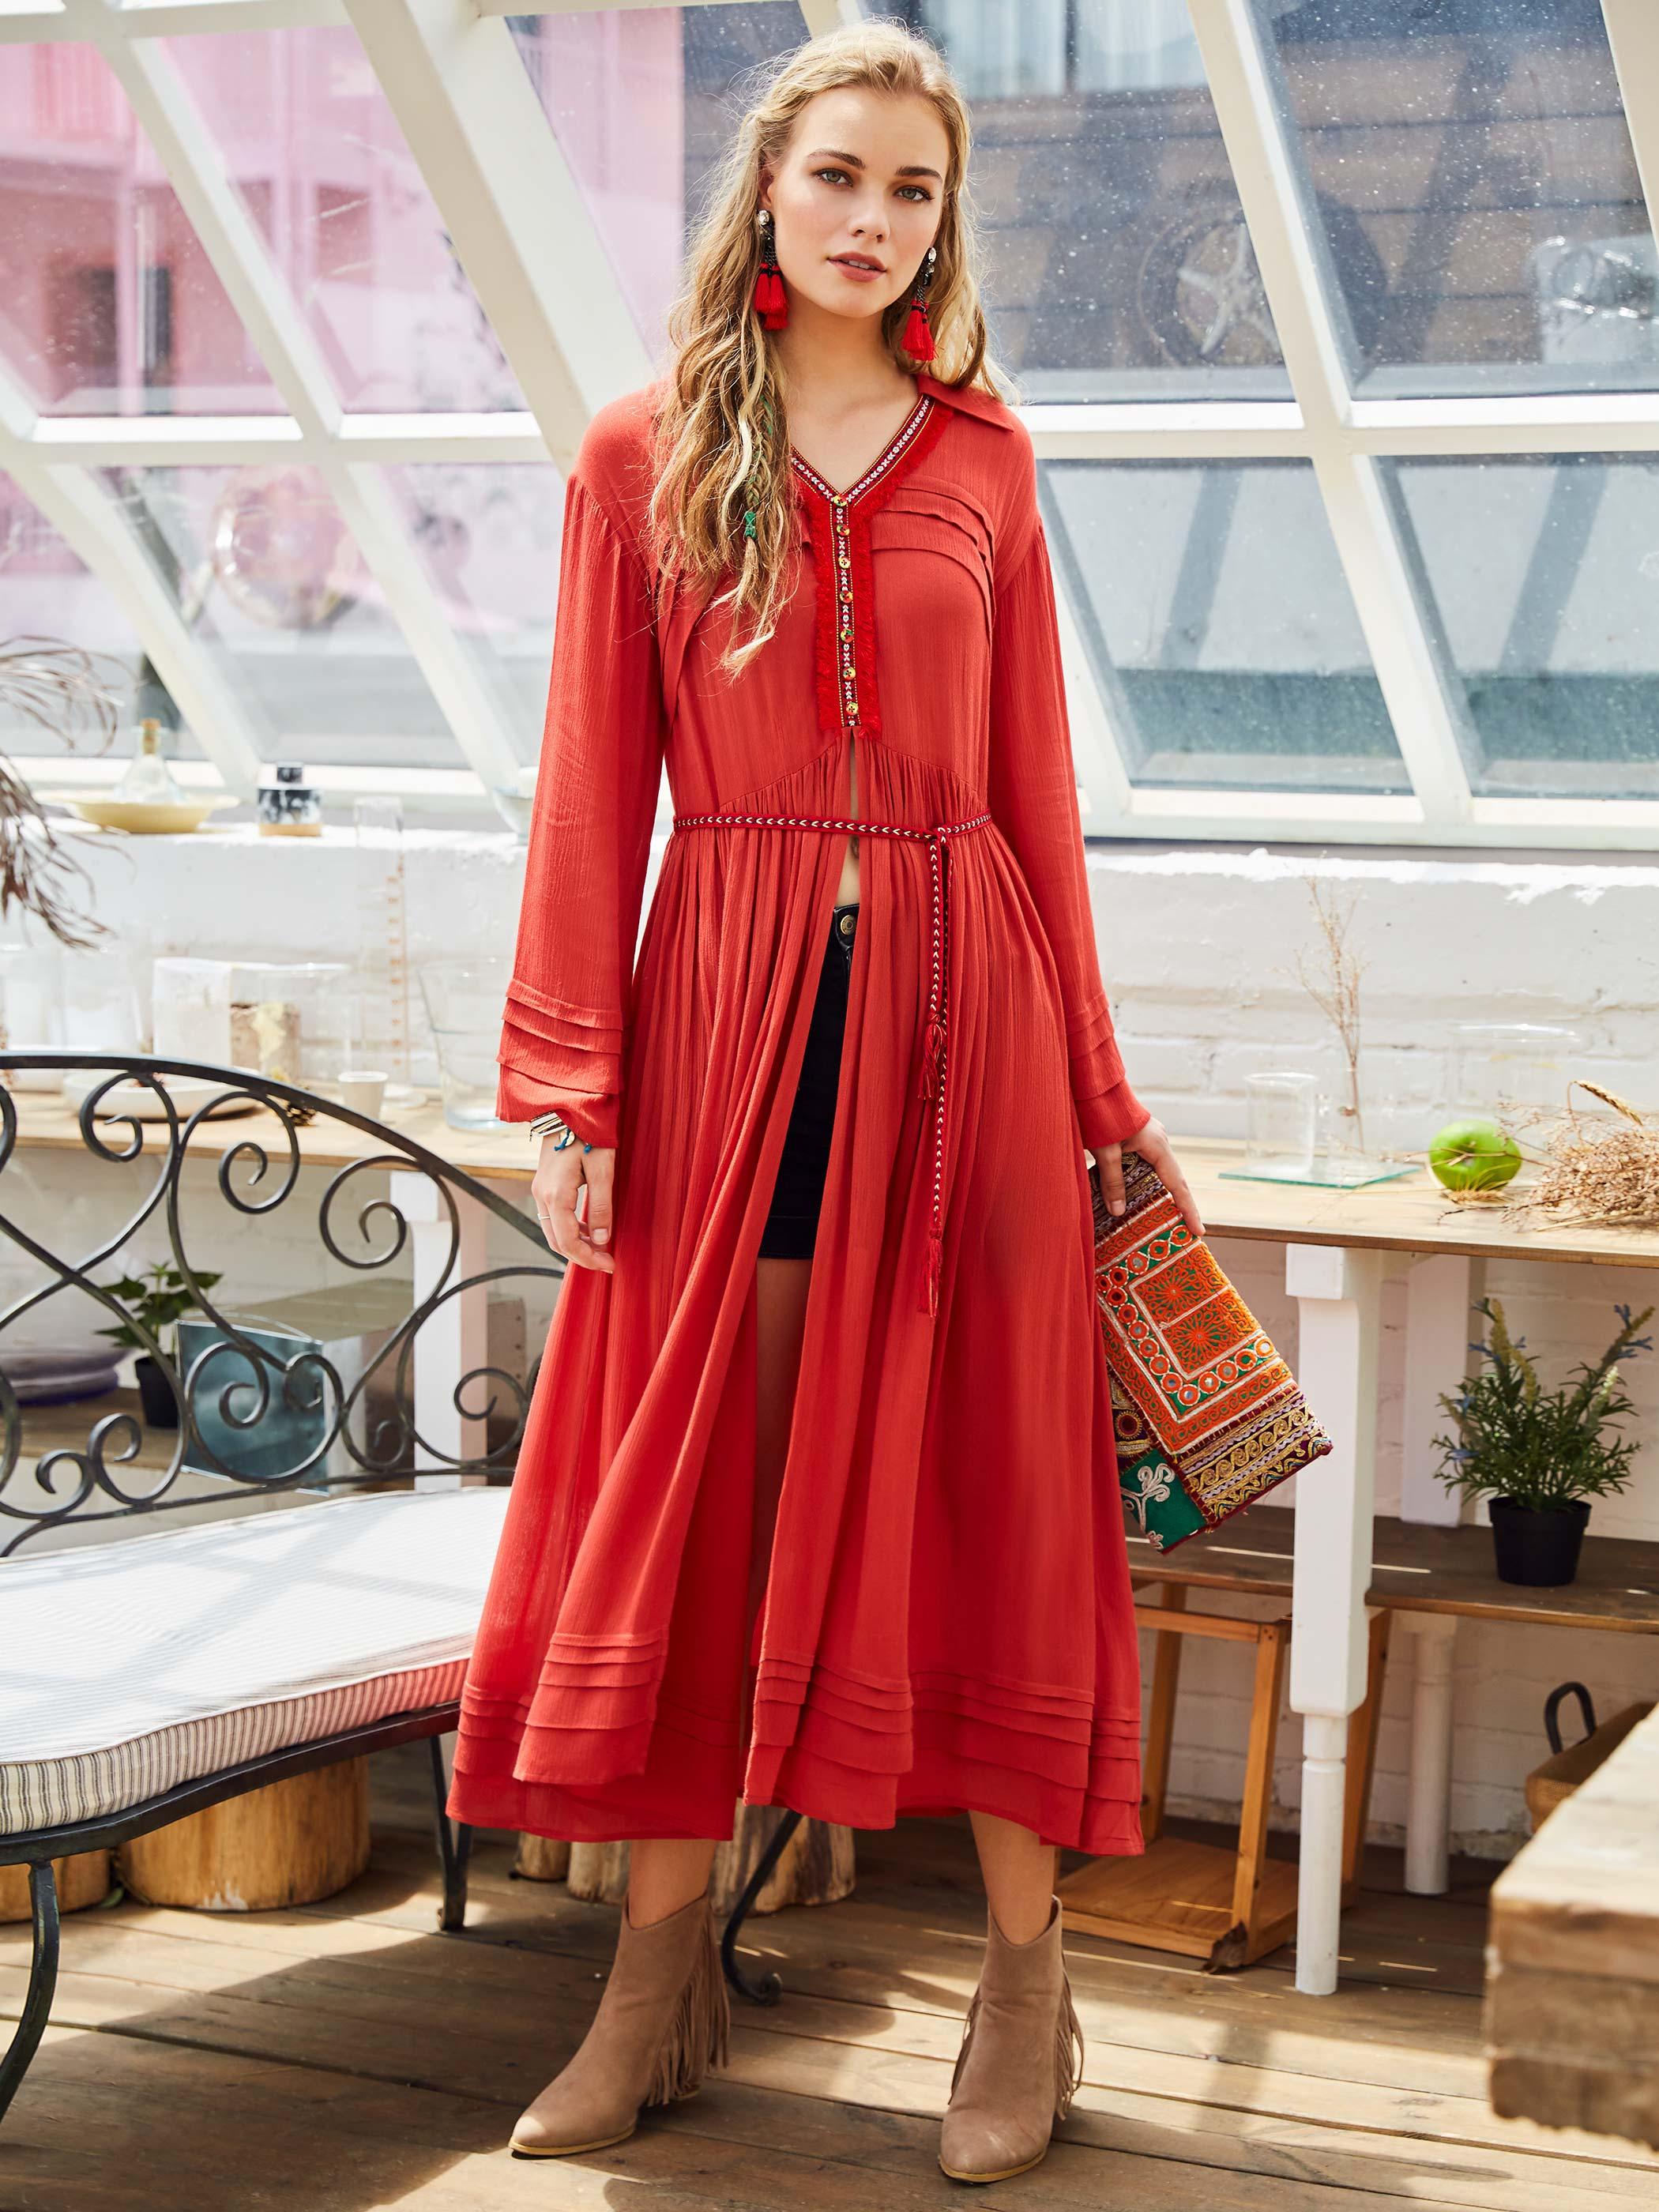 Vestido bohemio de retazos para mujer, vestido plisado bordado de primavera 2020, vestido informal OL de manga larga con botón de borla para mujer